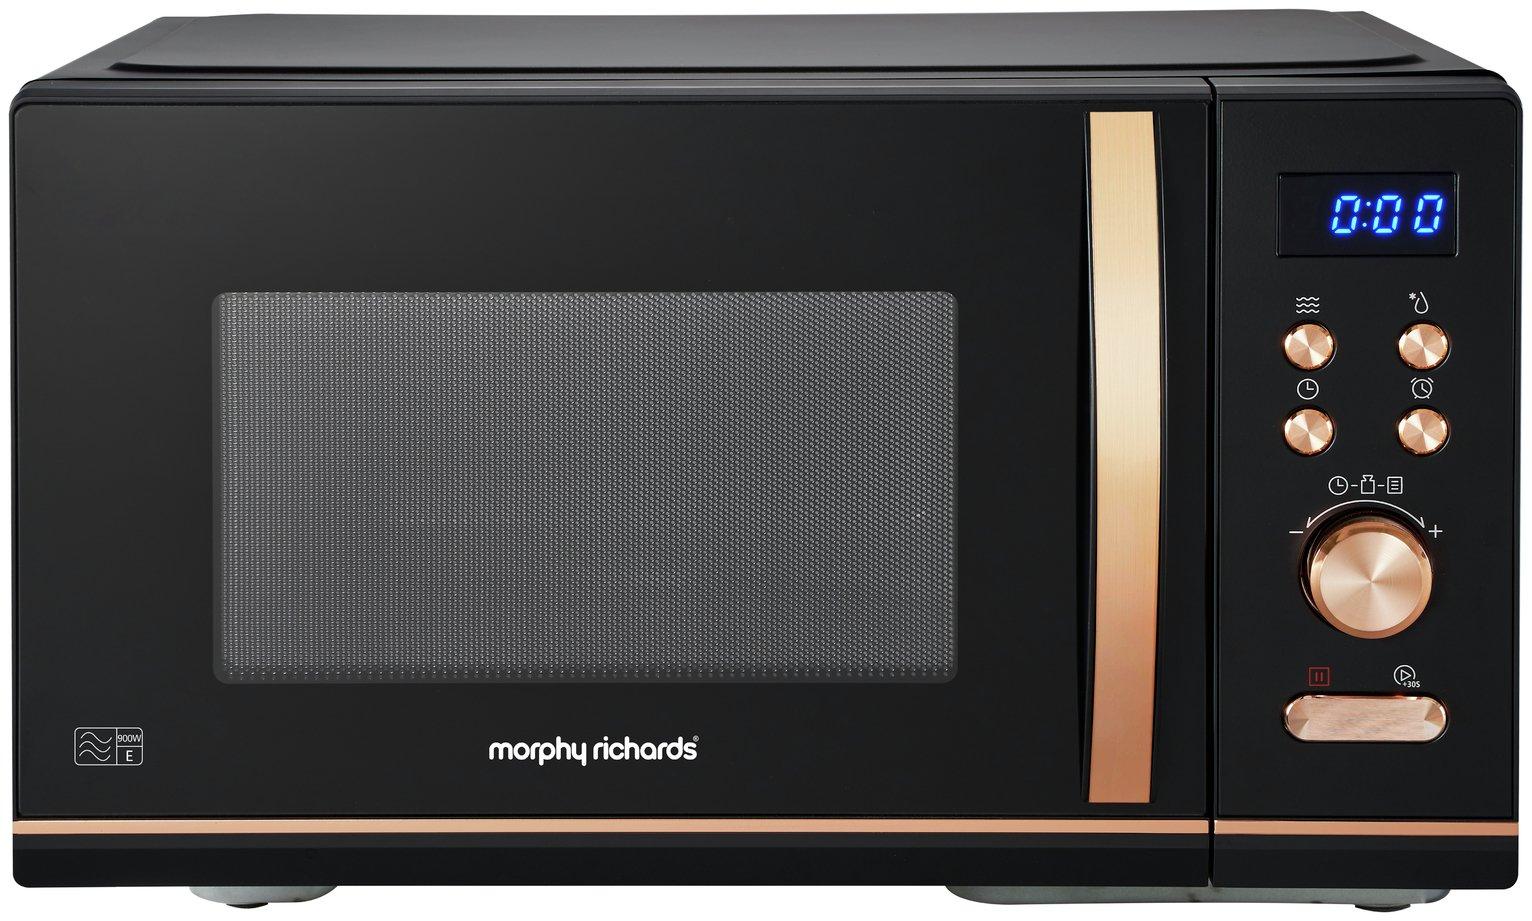 Morphy Richards 900W Standard Microwave - Rose Gold